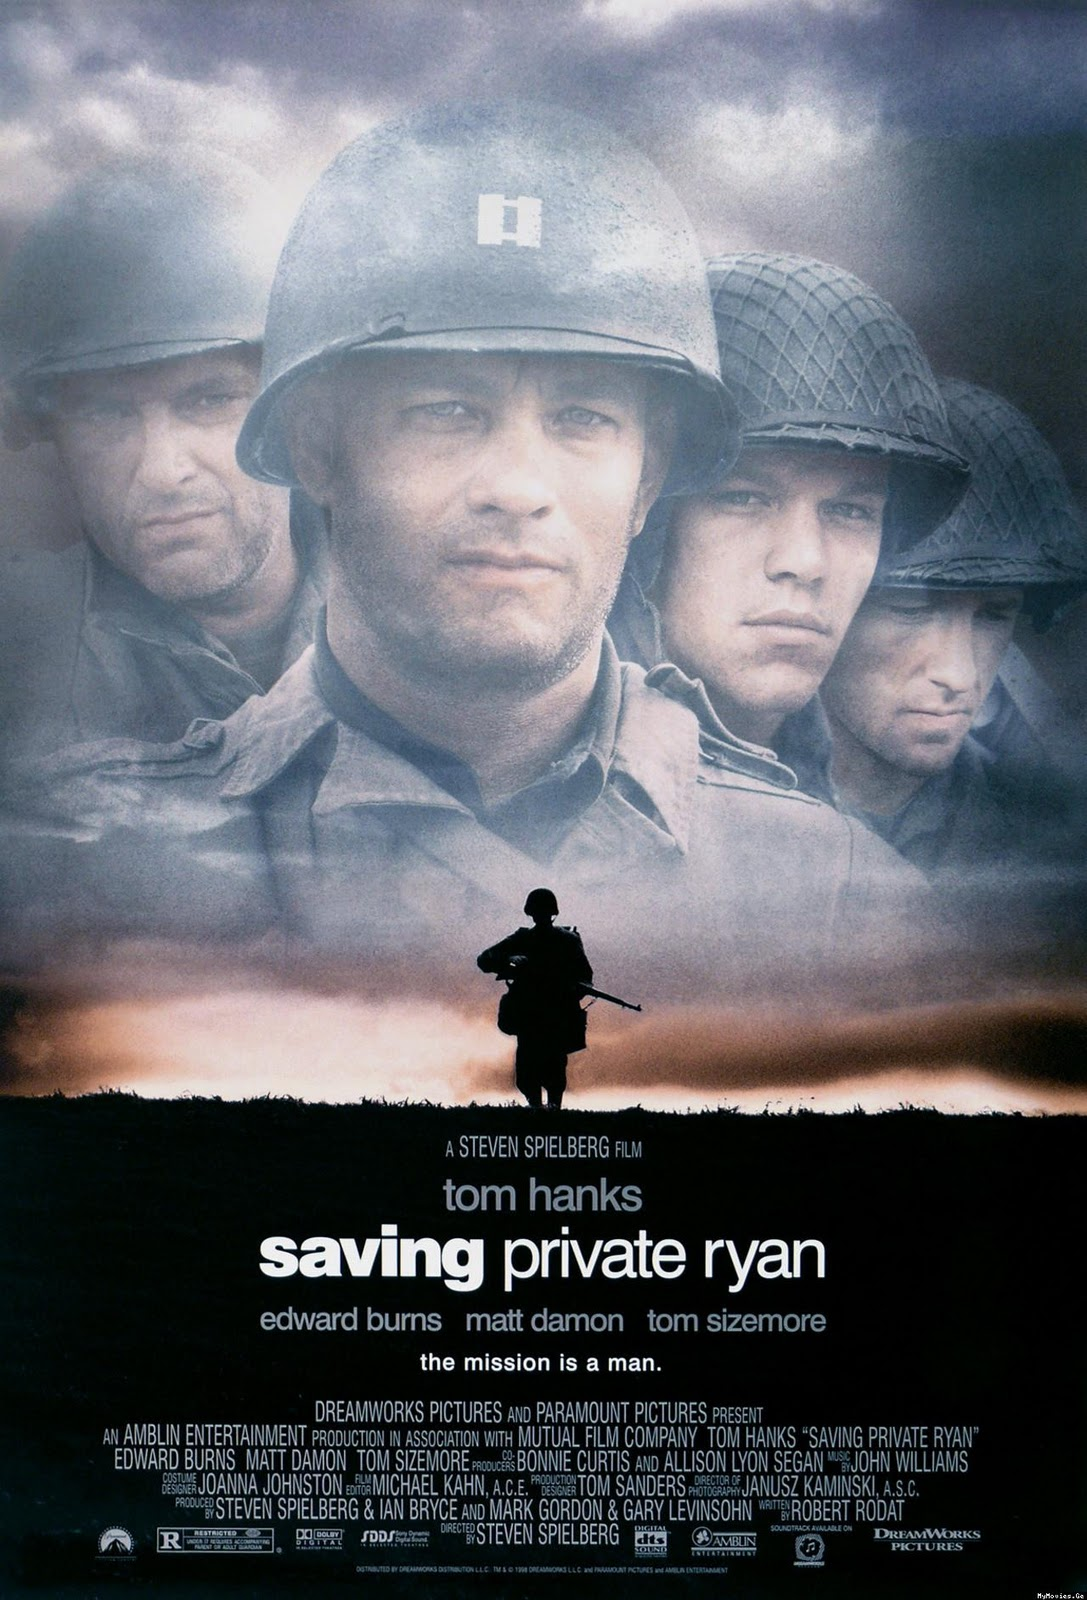 http://3.bp.blogspot.com/-kOq0mfuSiyQ/TtM1-_OHnlI/AAAAAAAABHM/MBpnM3CtmRQ/s1600/Saving+Private+Ryan.jpg